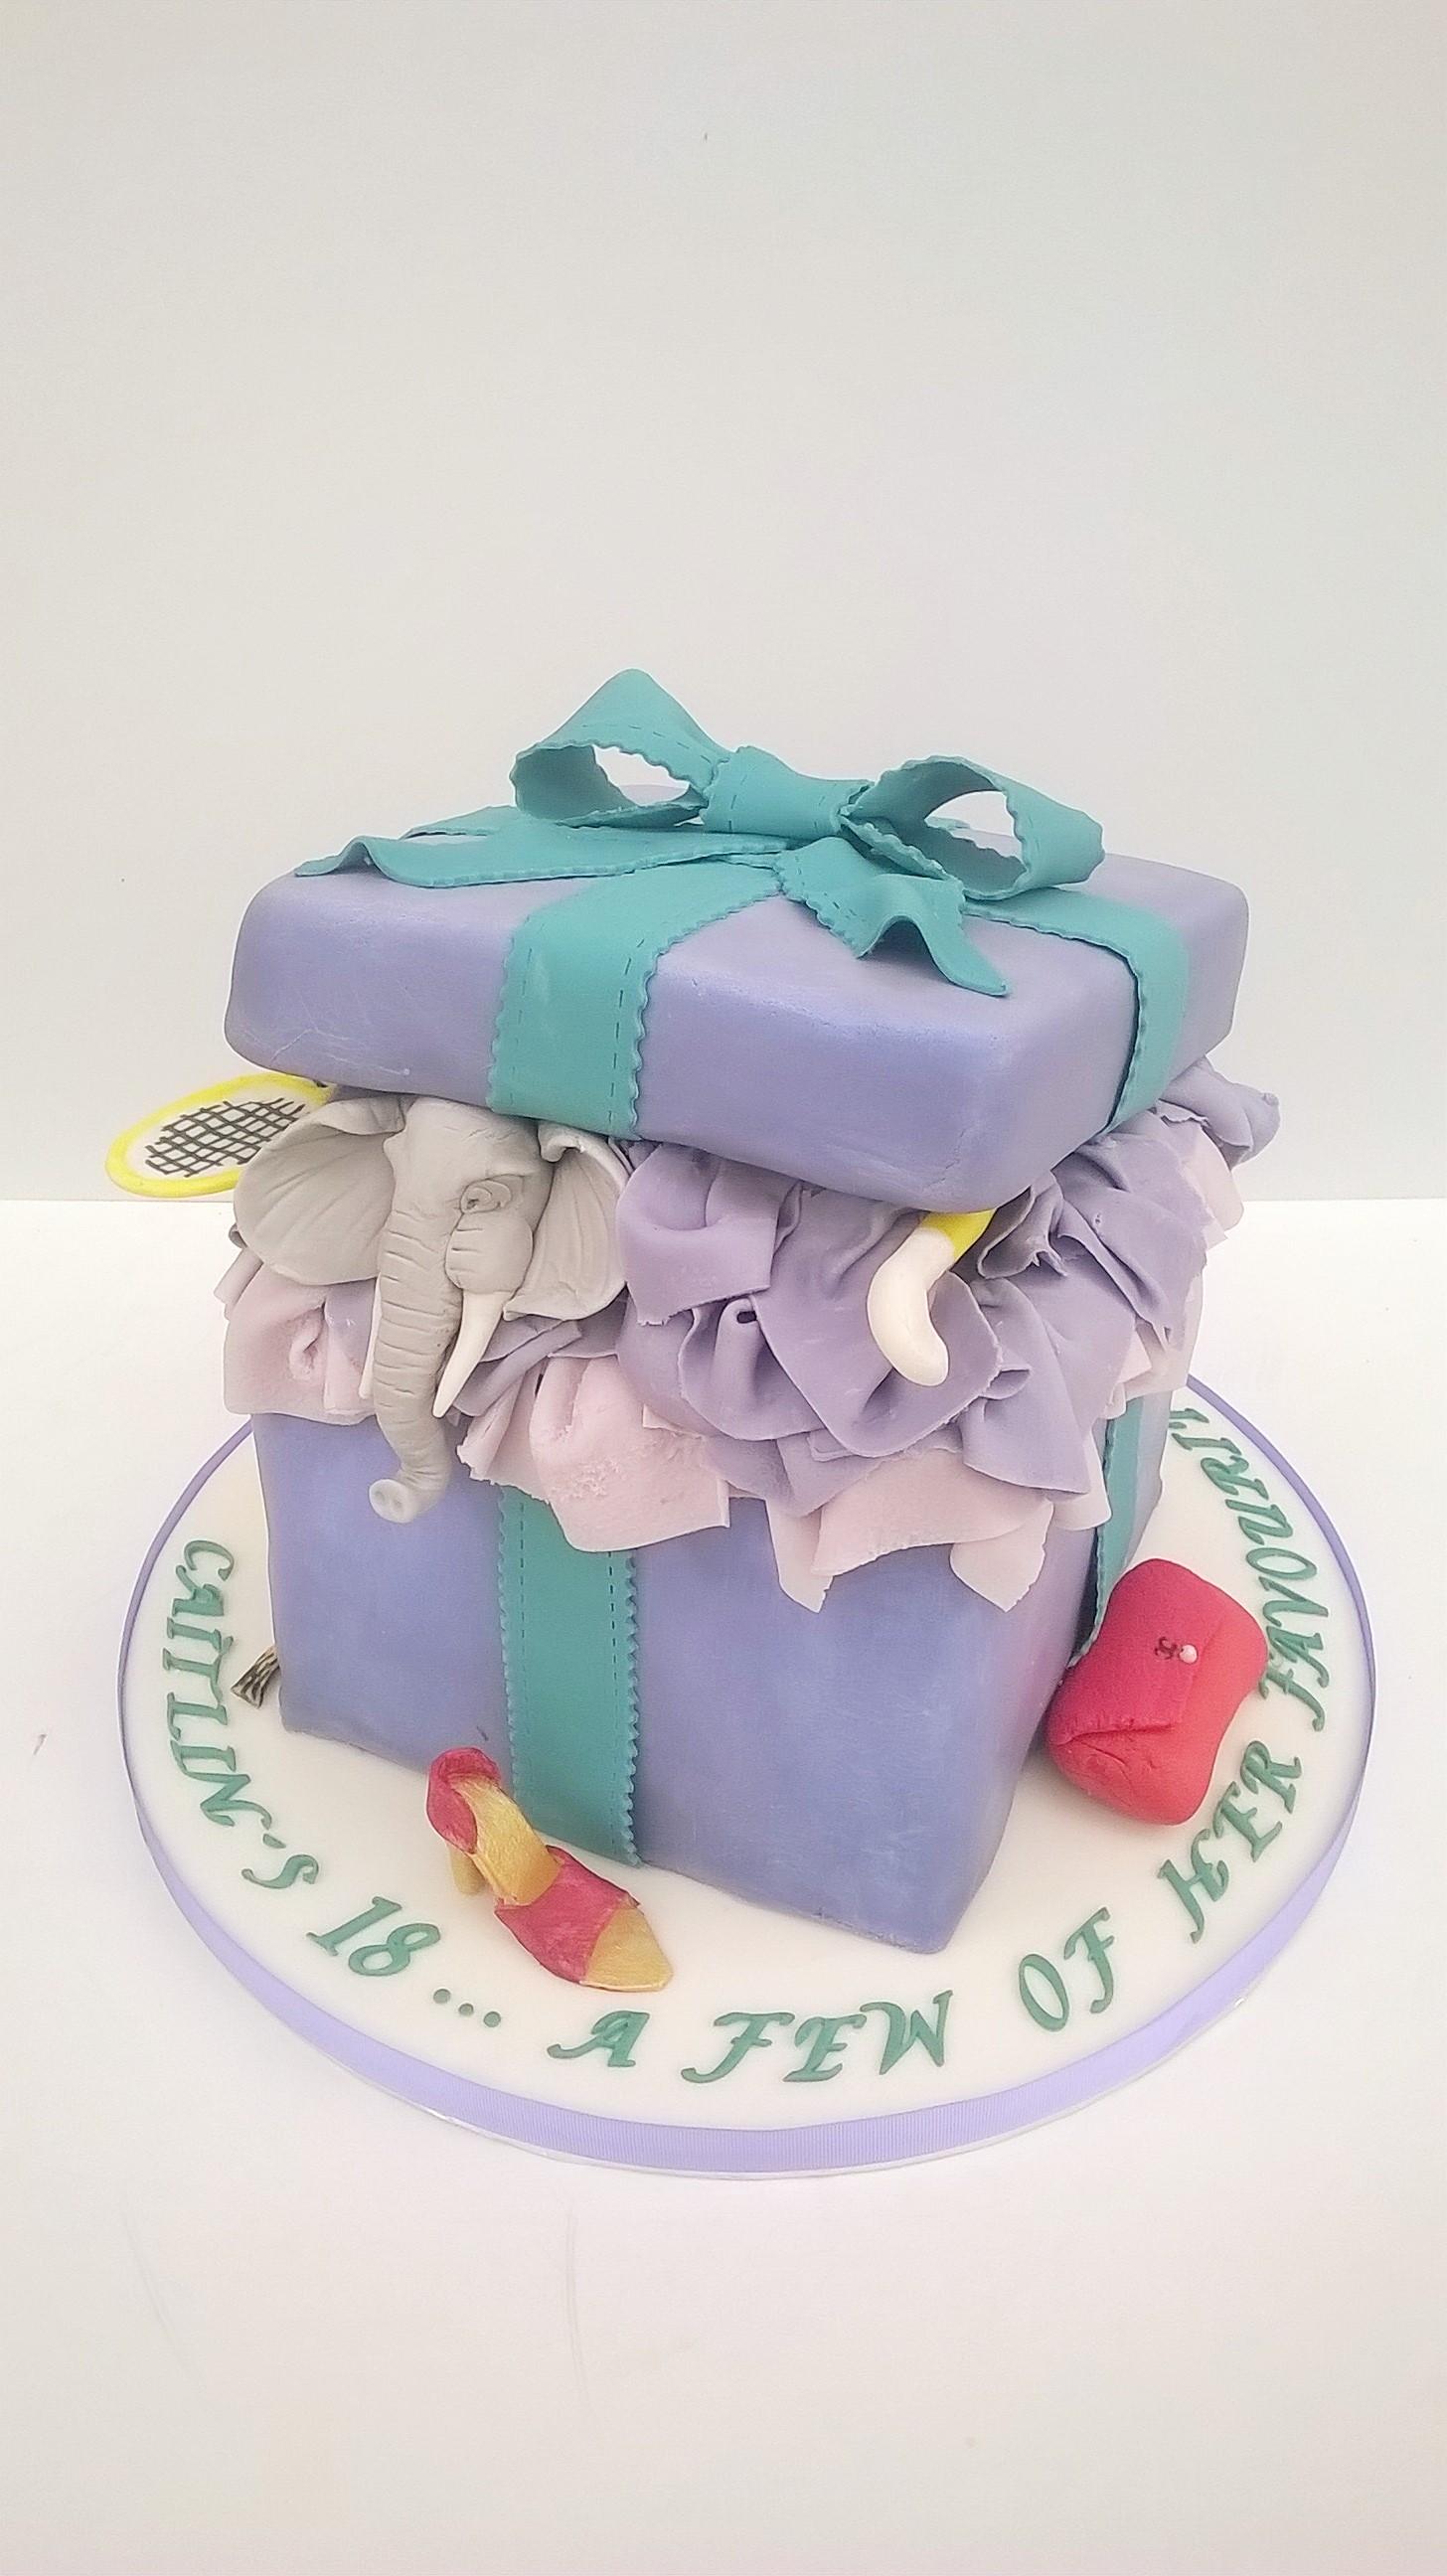 Parcel party cake